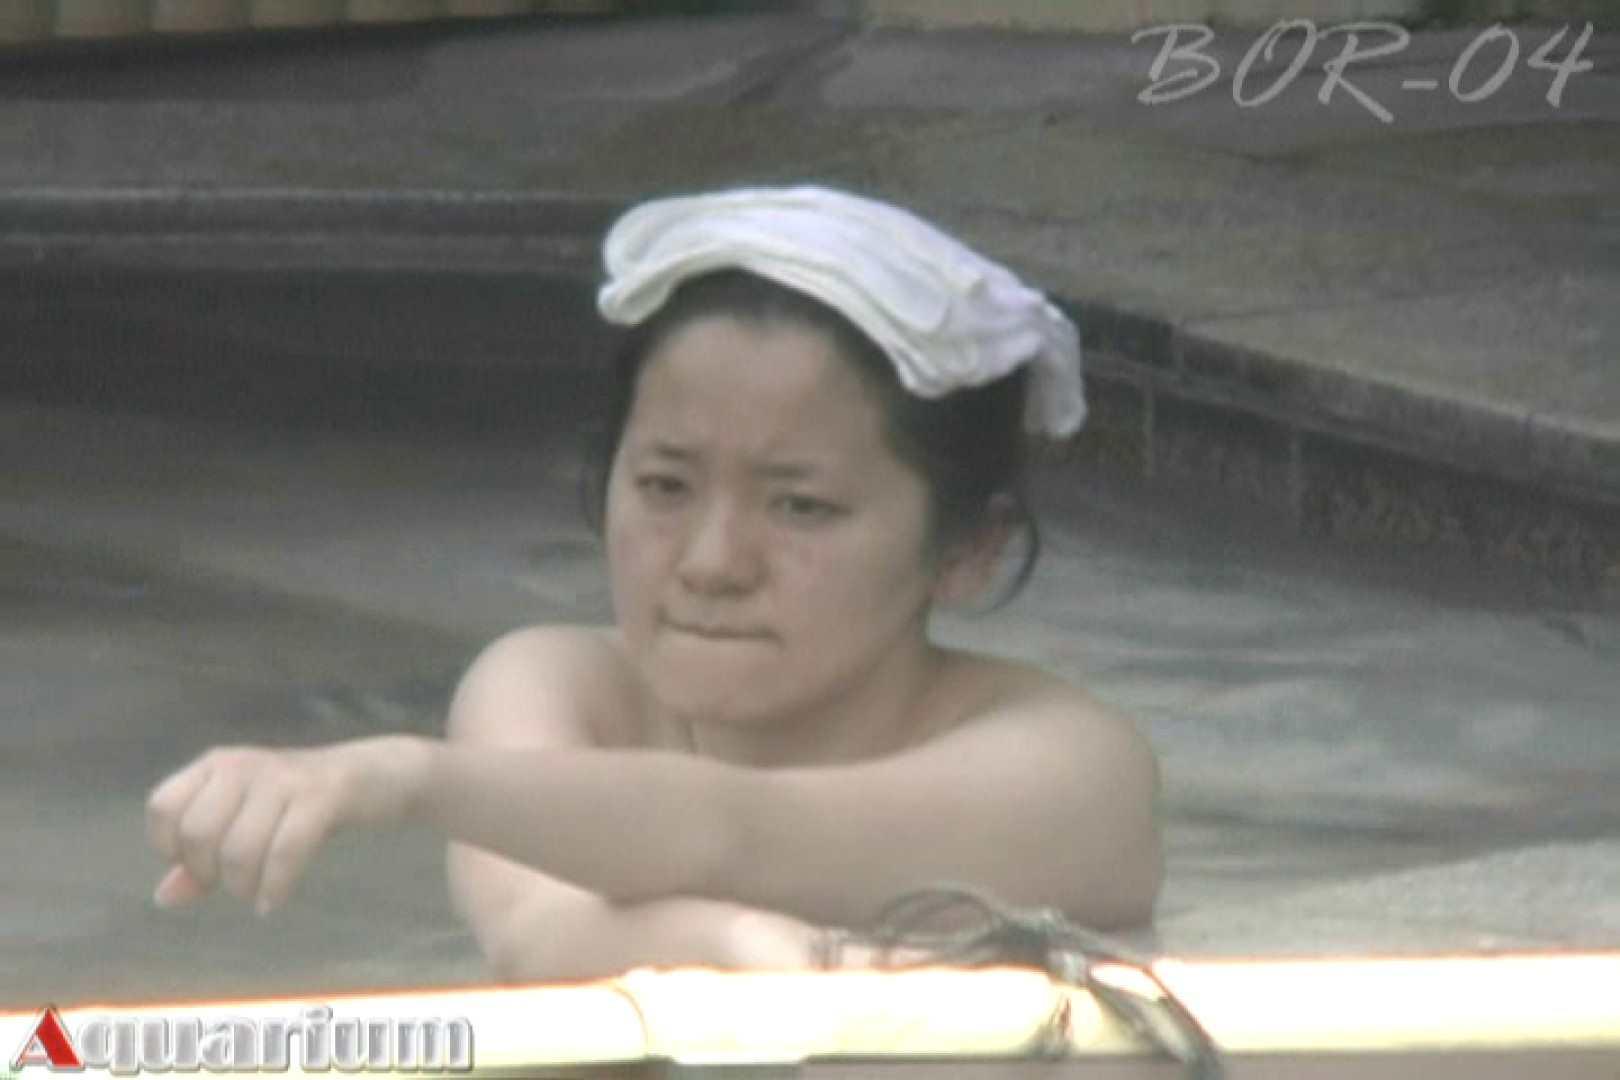 Aquaな露天風呂Vol.506 盗撮 のぞき動画画像 99連発 23